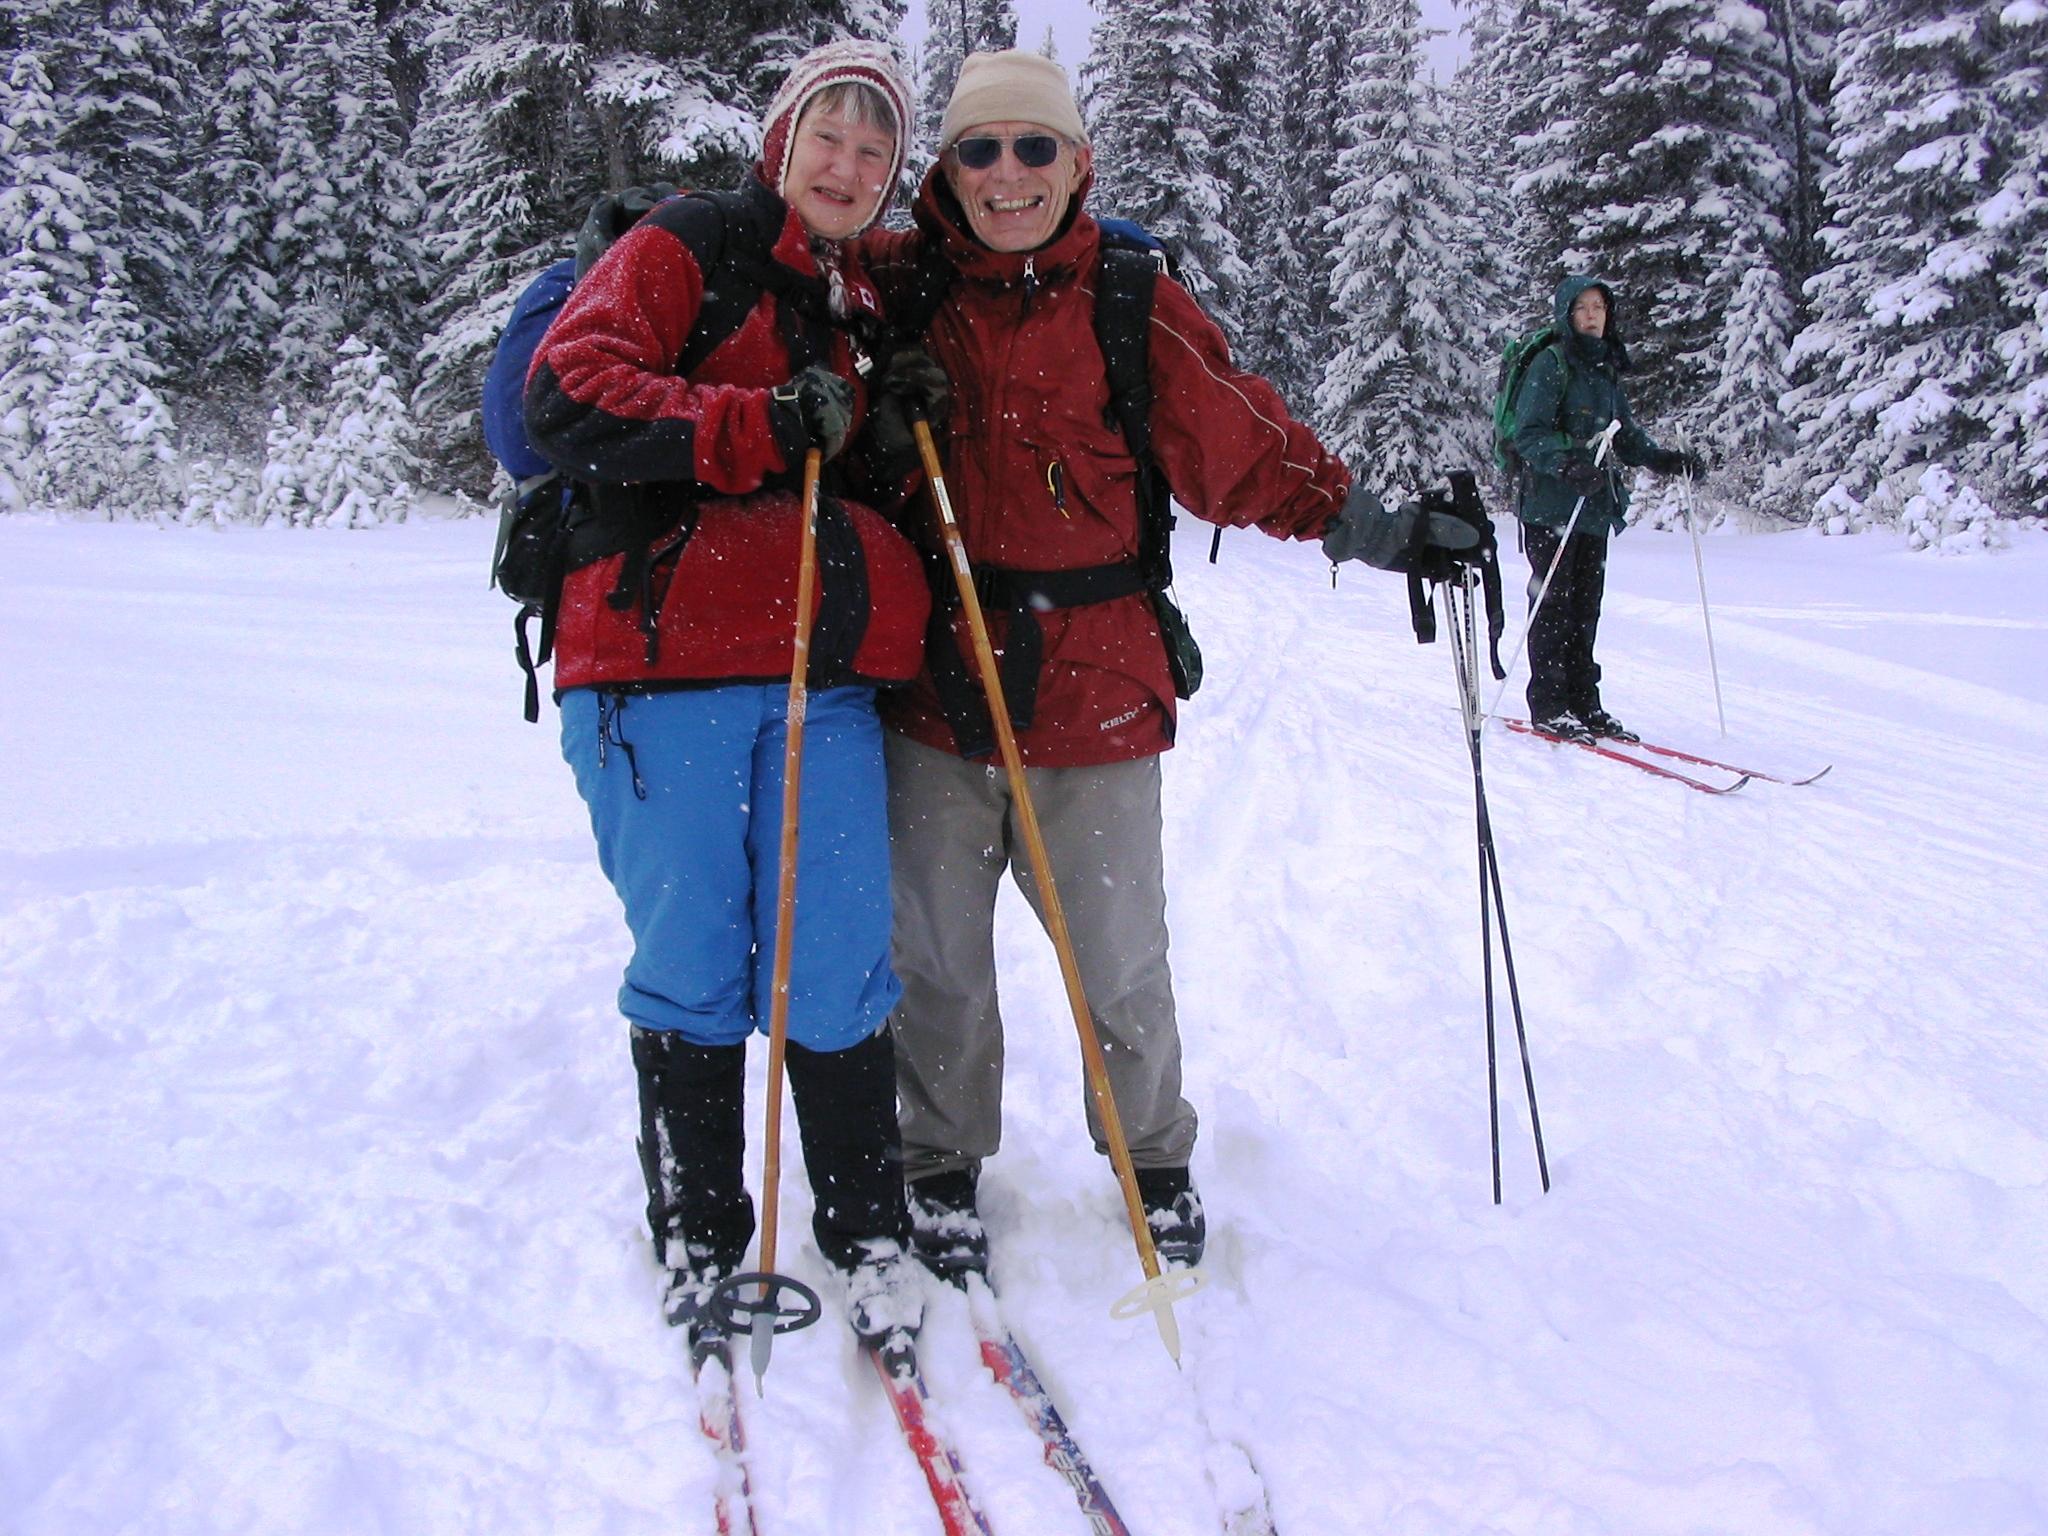 Johanna & Jim from Norseman Ski club on Elk Pass